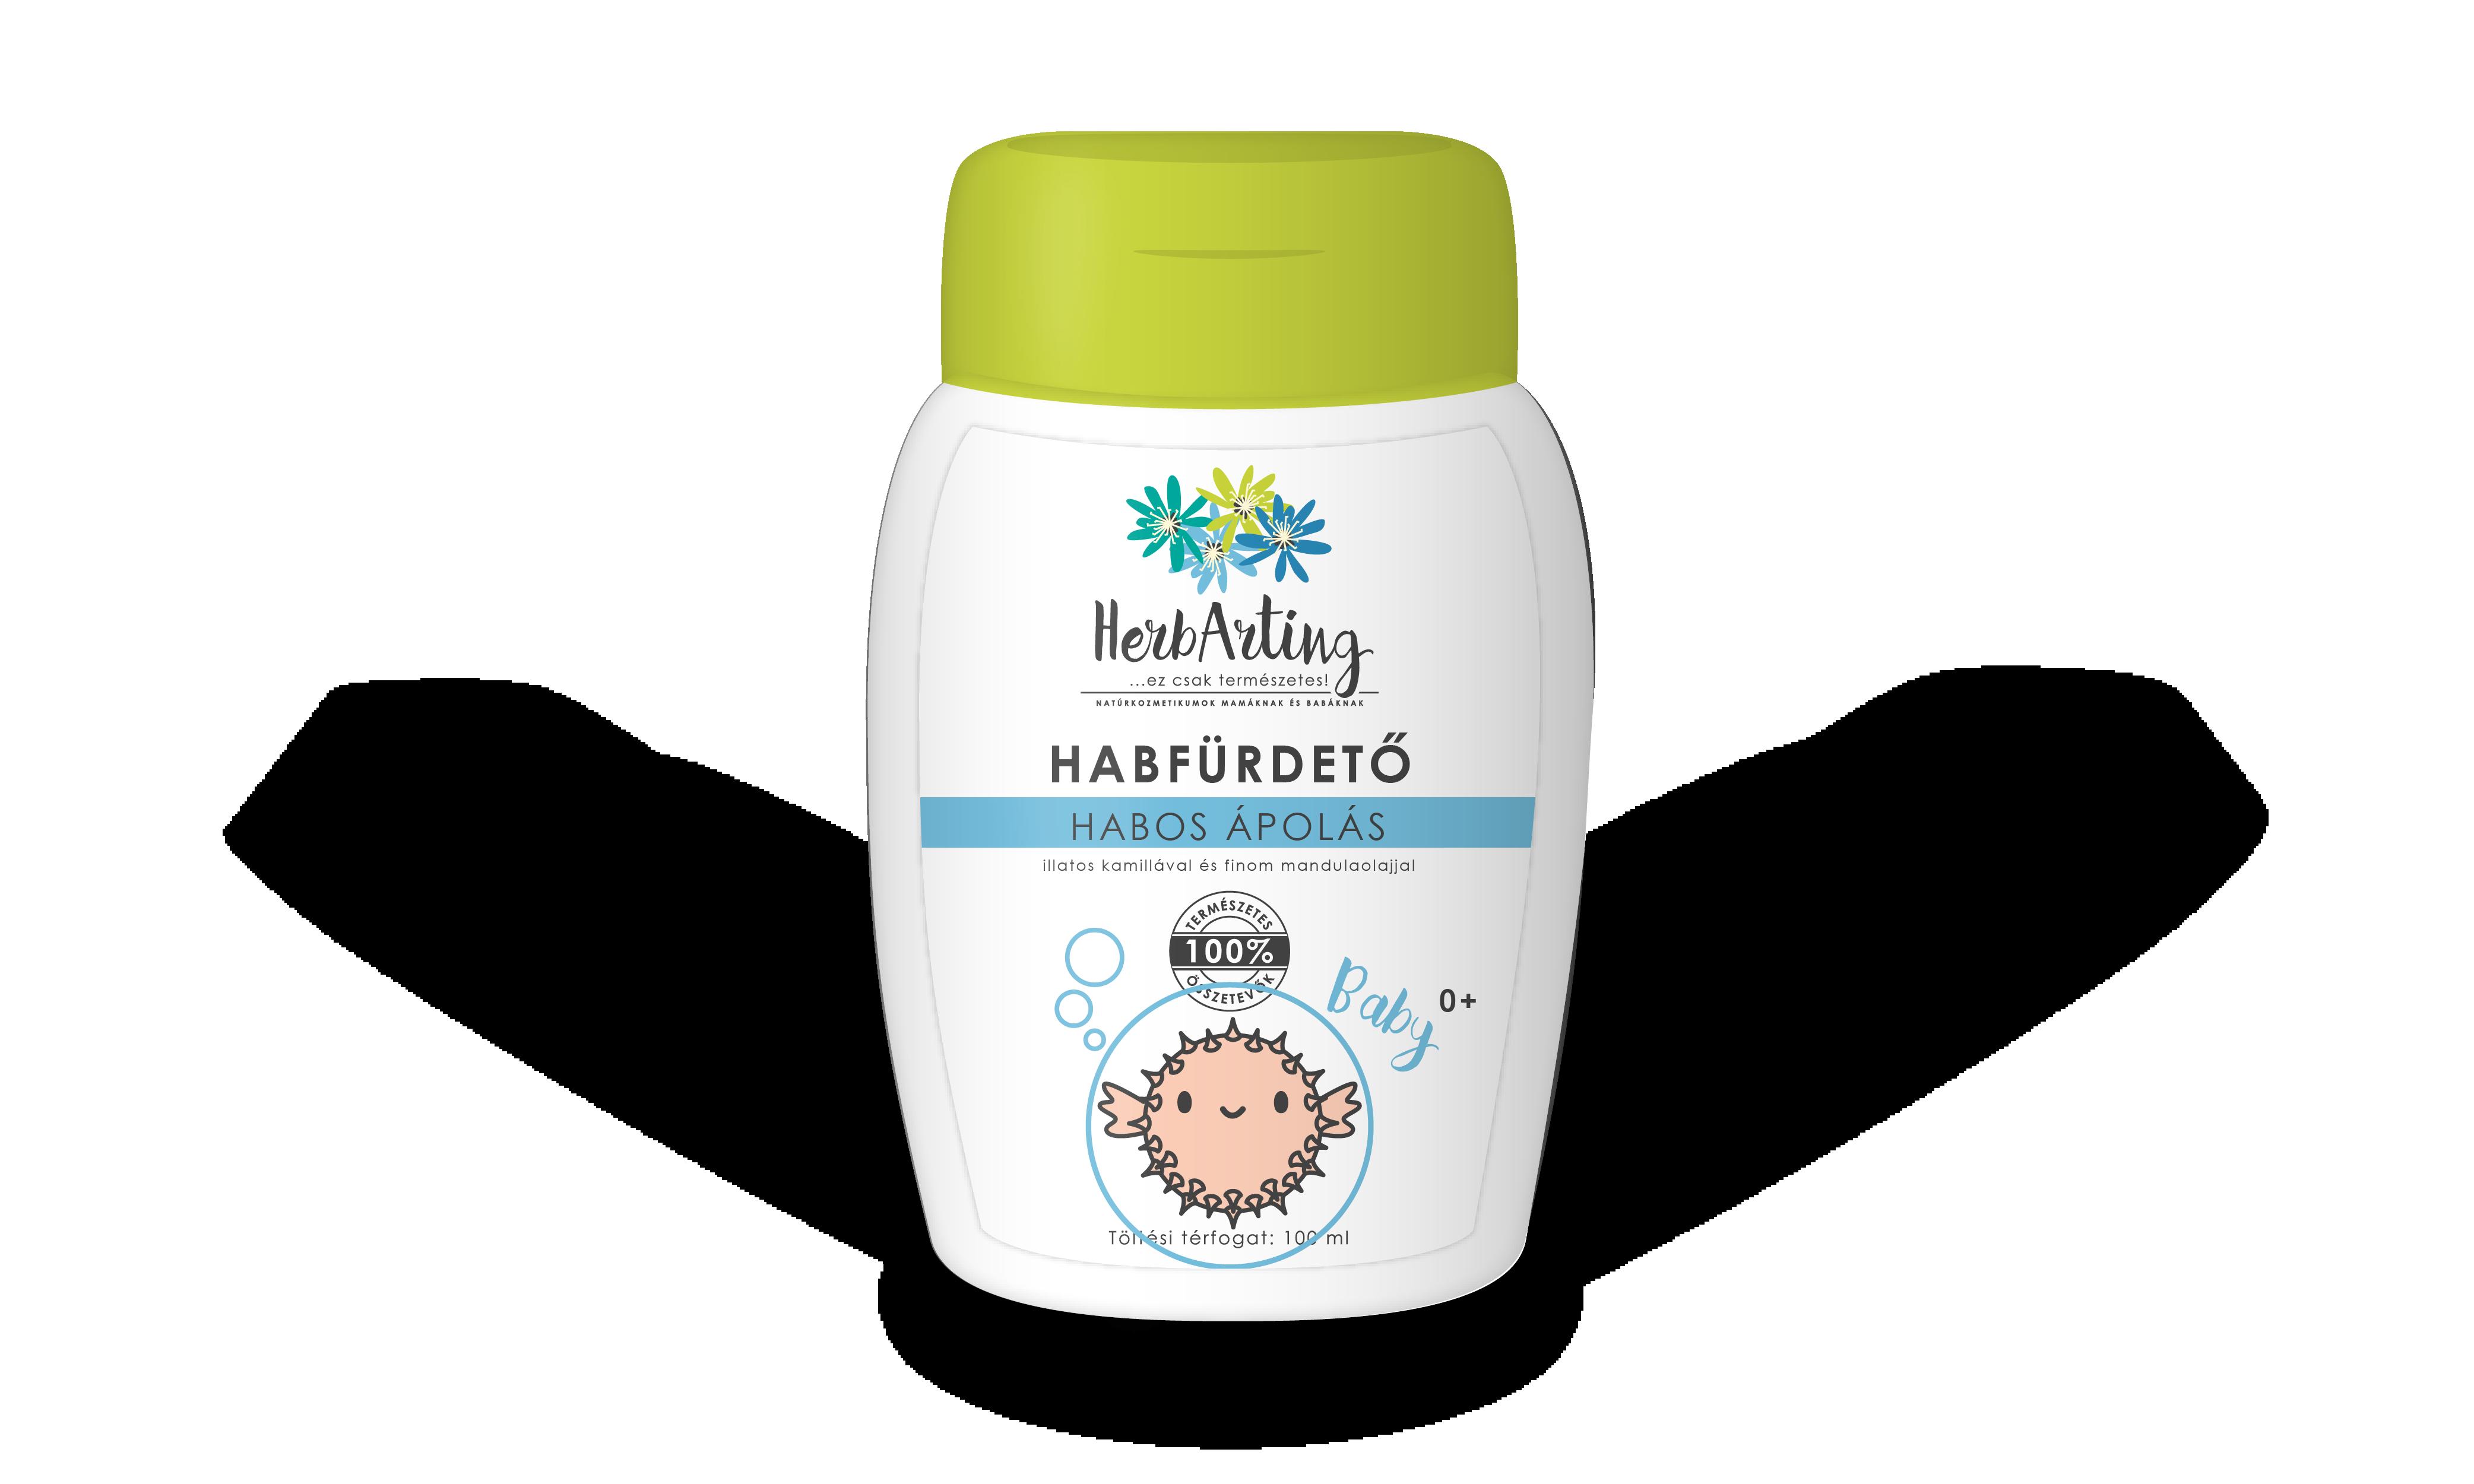 HerbArting habfürdő 100 ml